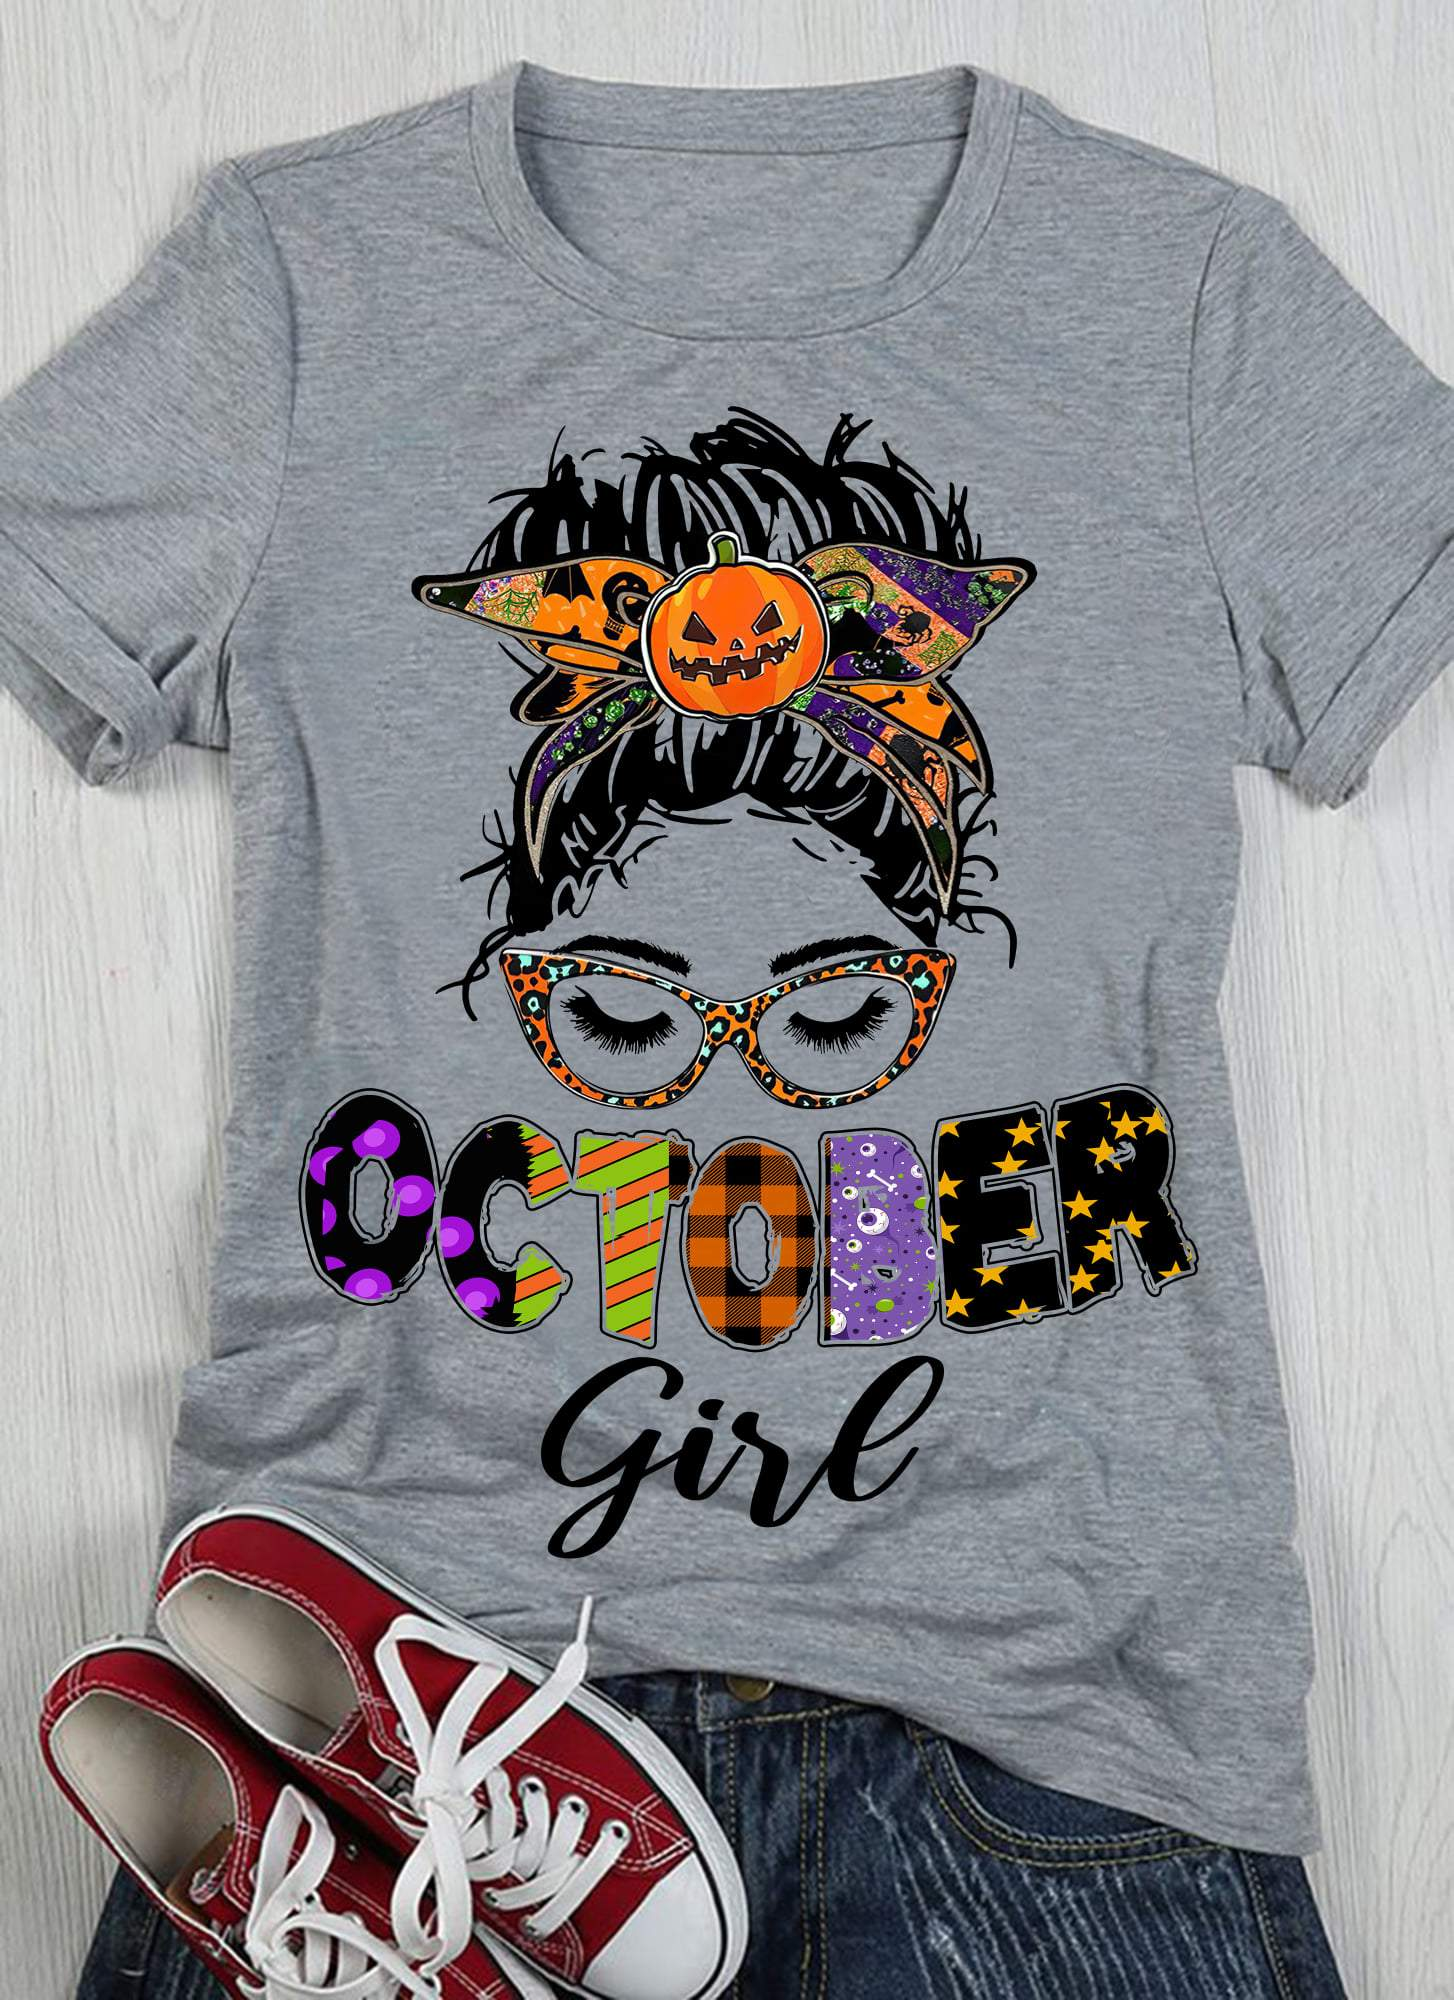 Birthday Shirt, Gift For October Girl, Birthday Shirts For Women, Halloween October Girl T-Shirt